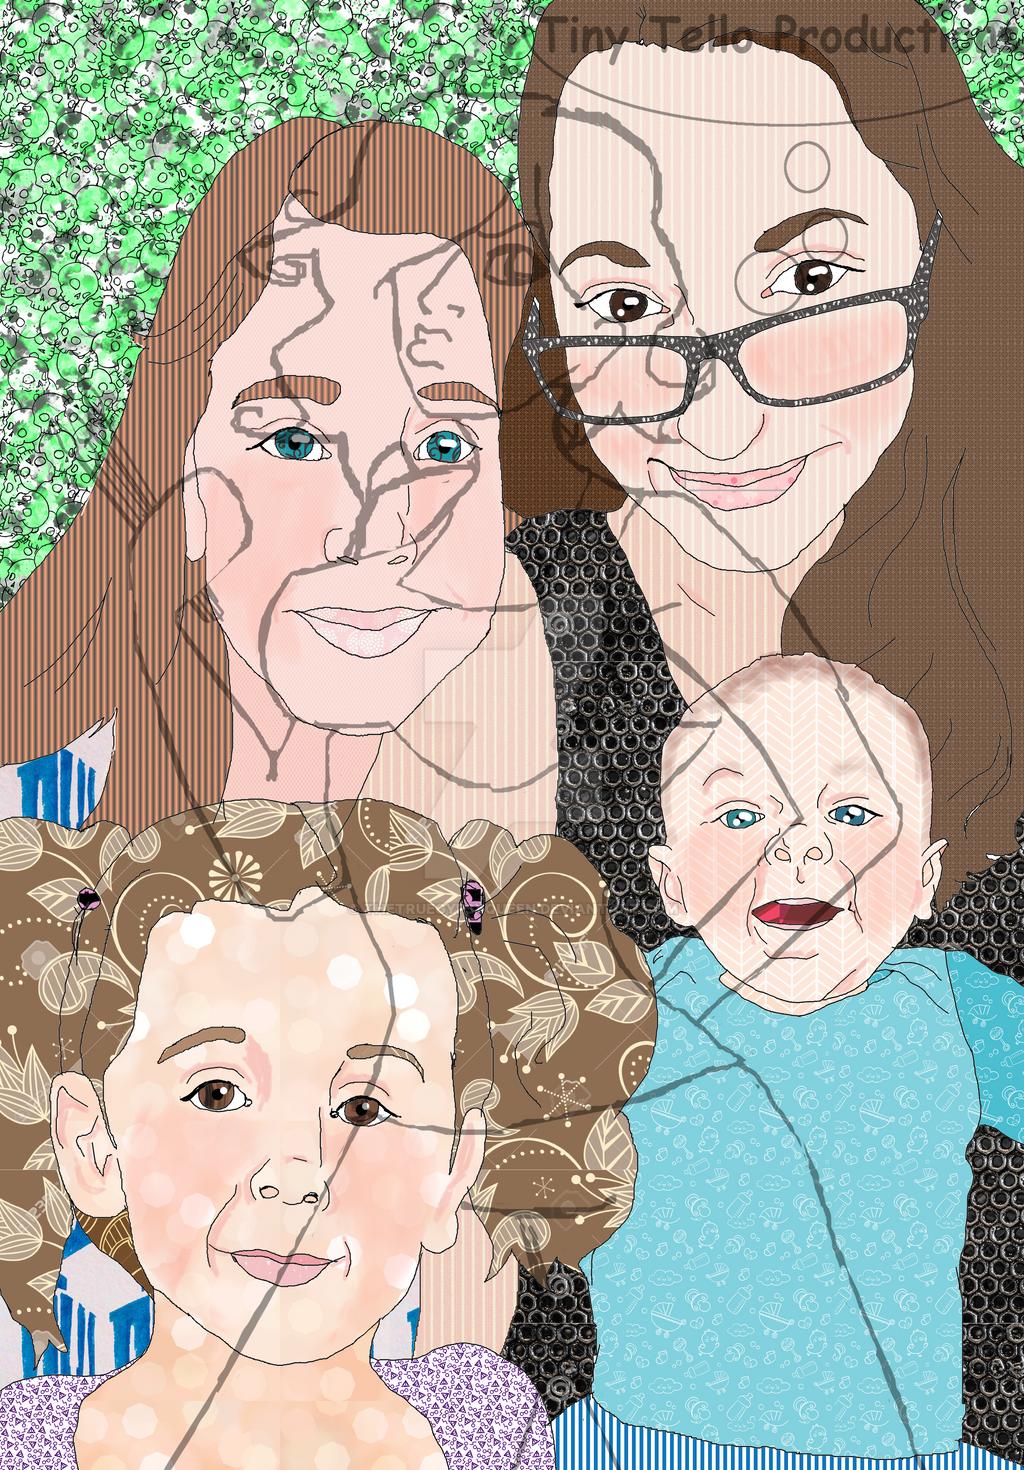 Chelsea mothers day2017 by TheTrueGypsyQueen